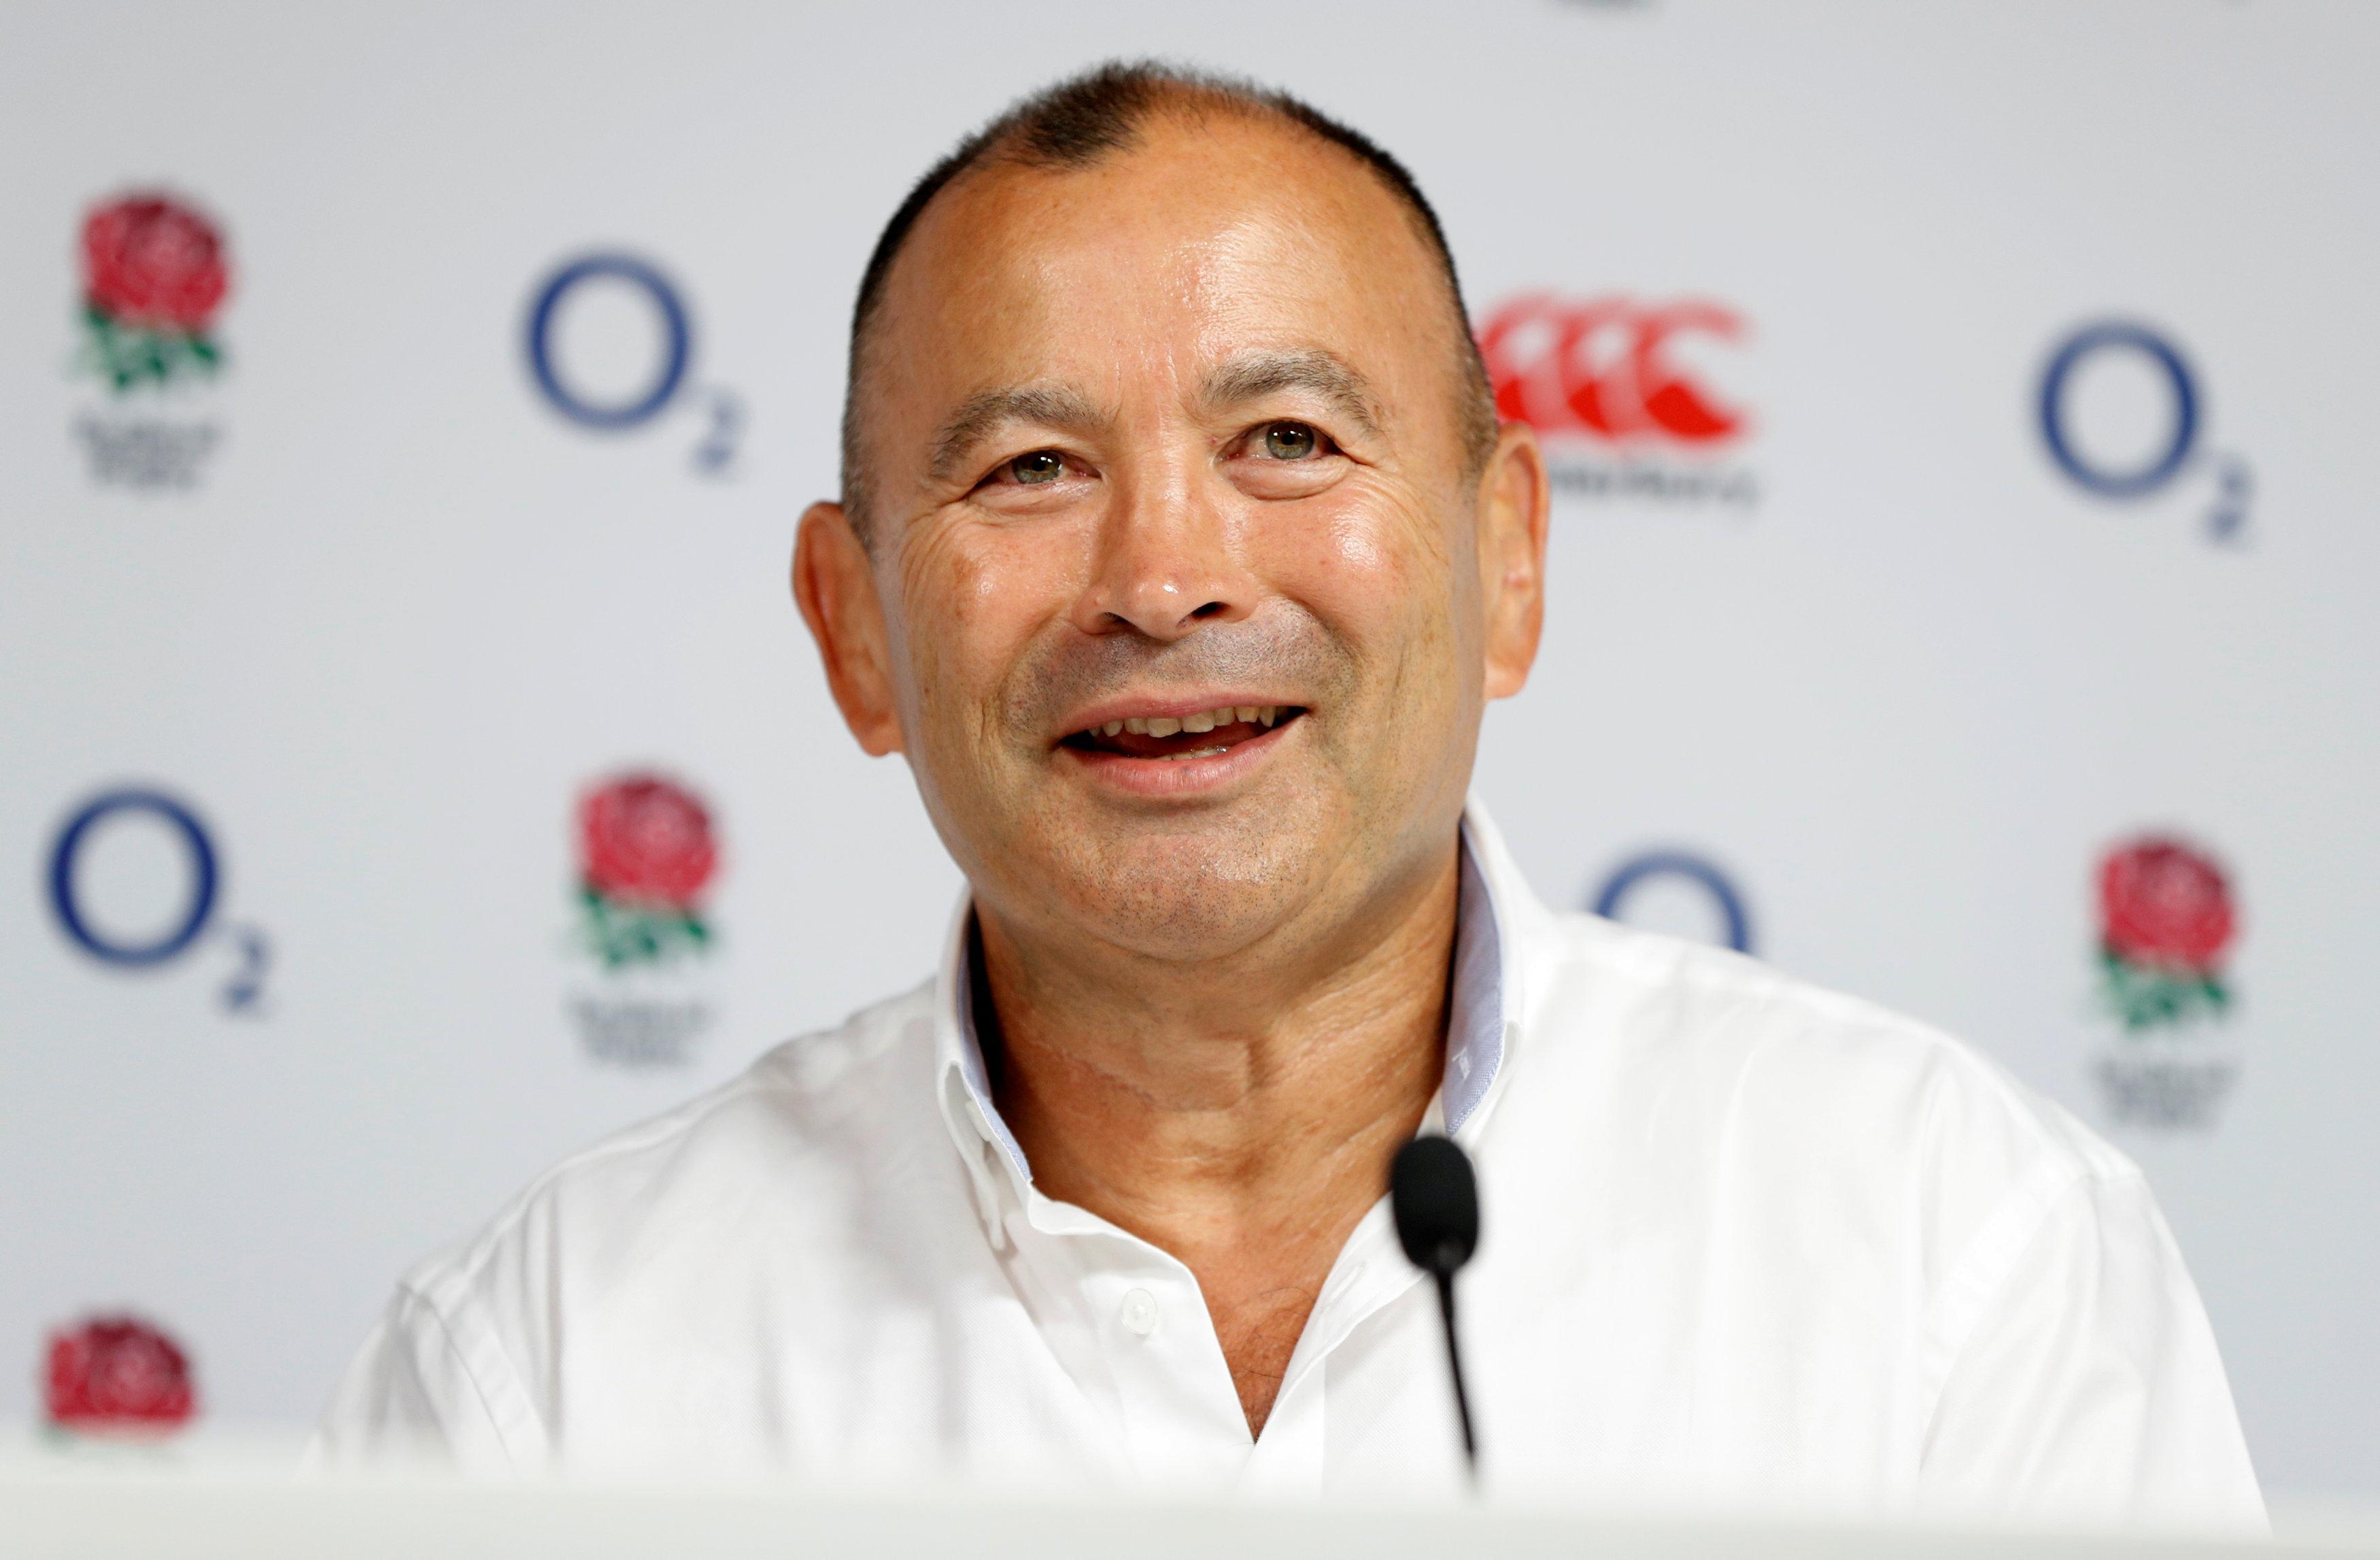 England coach Jones has come under pressure following a series of defeats